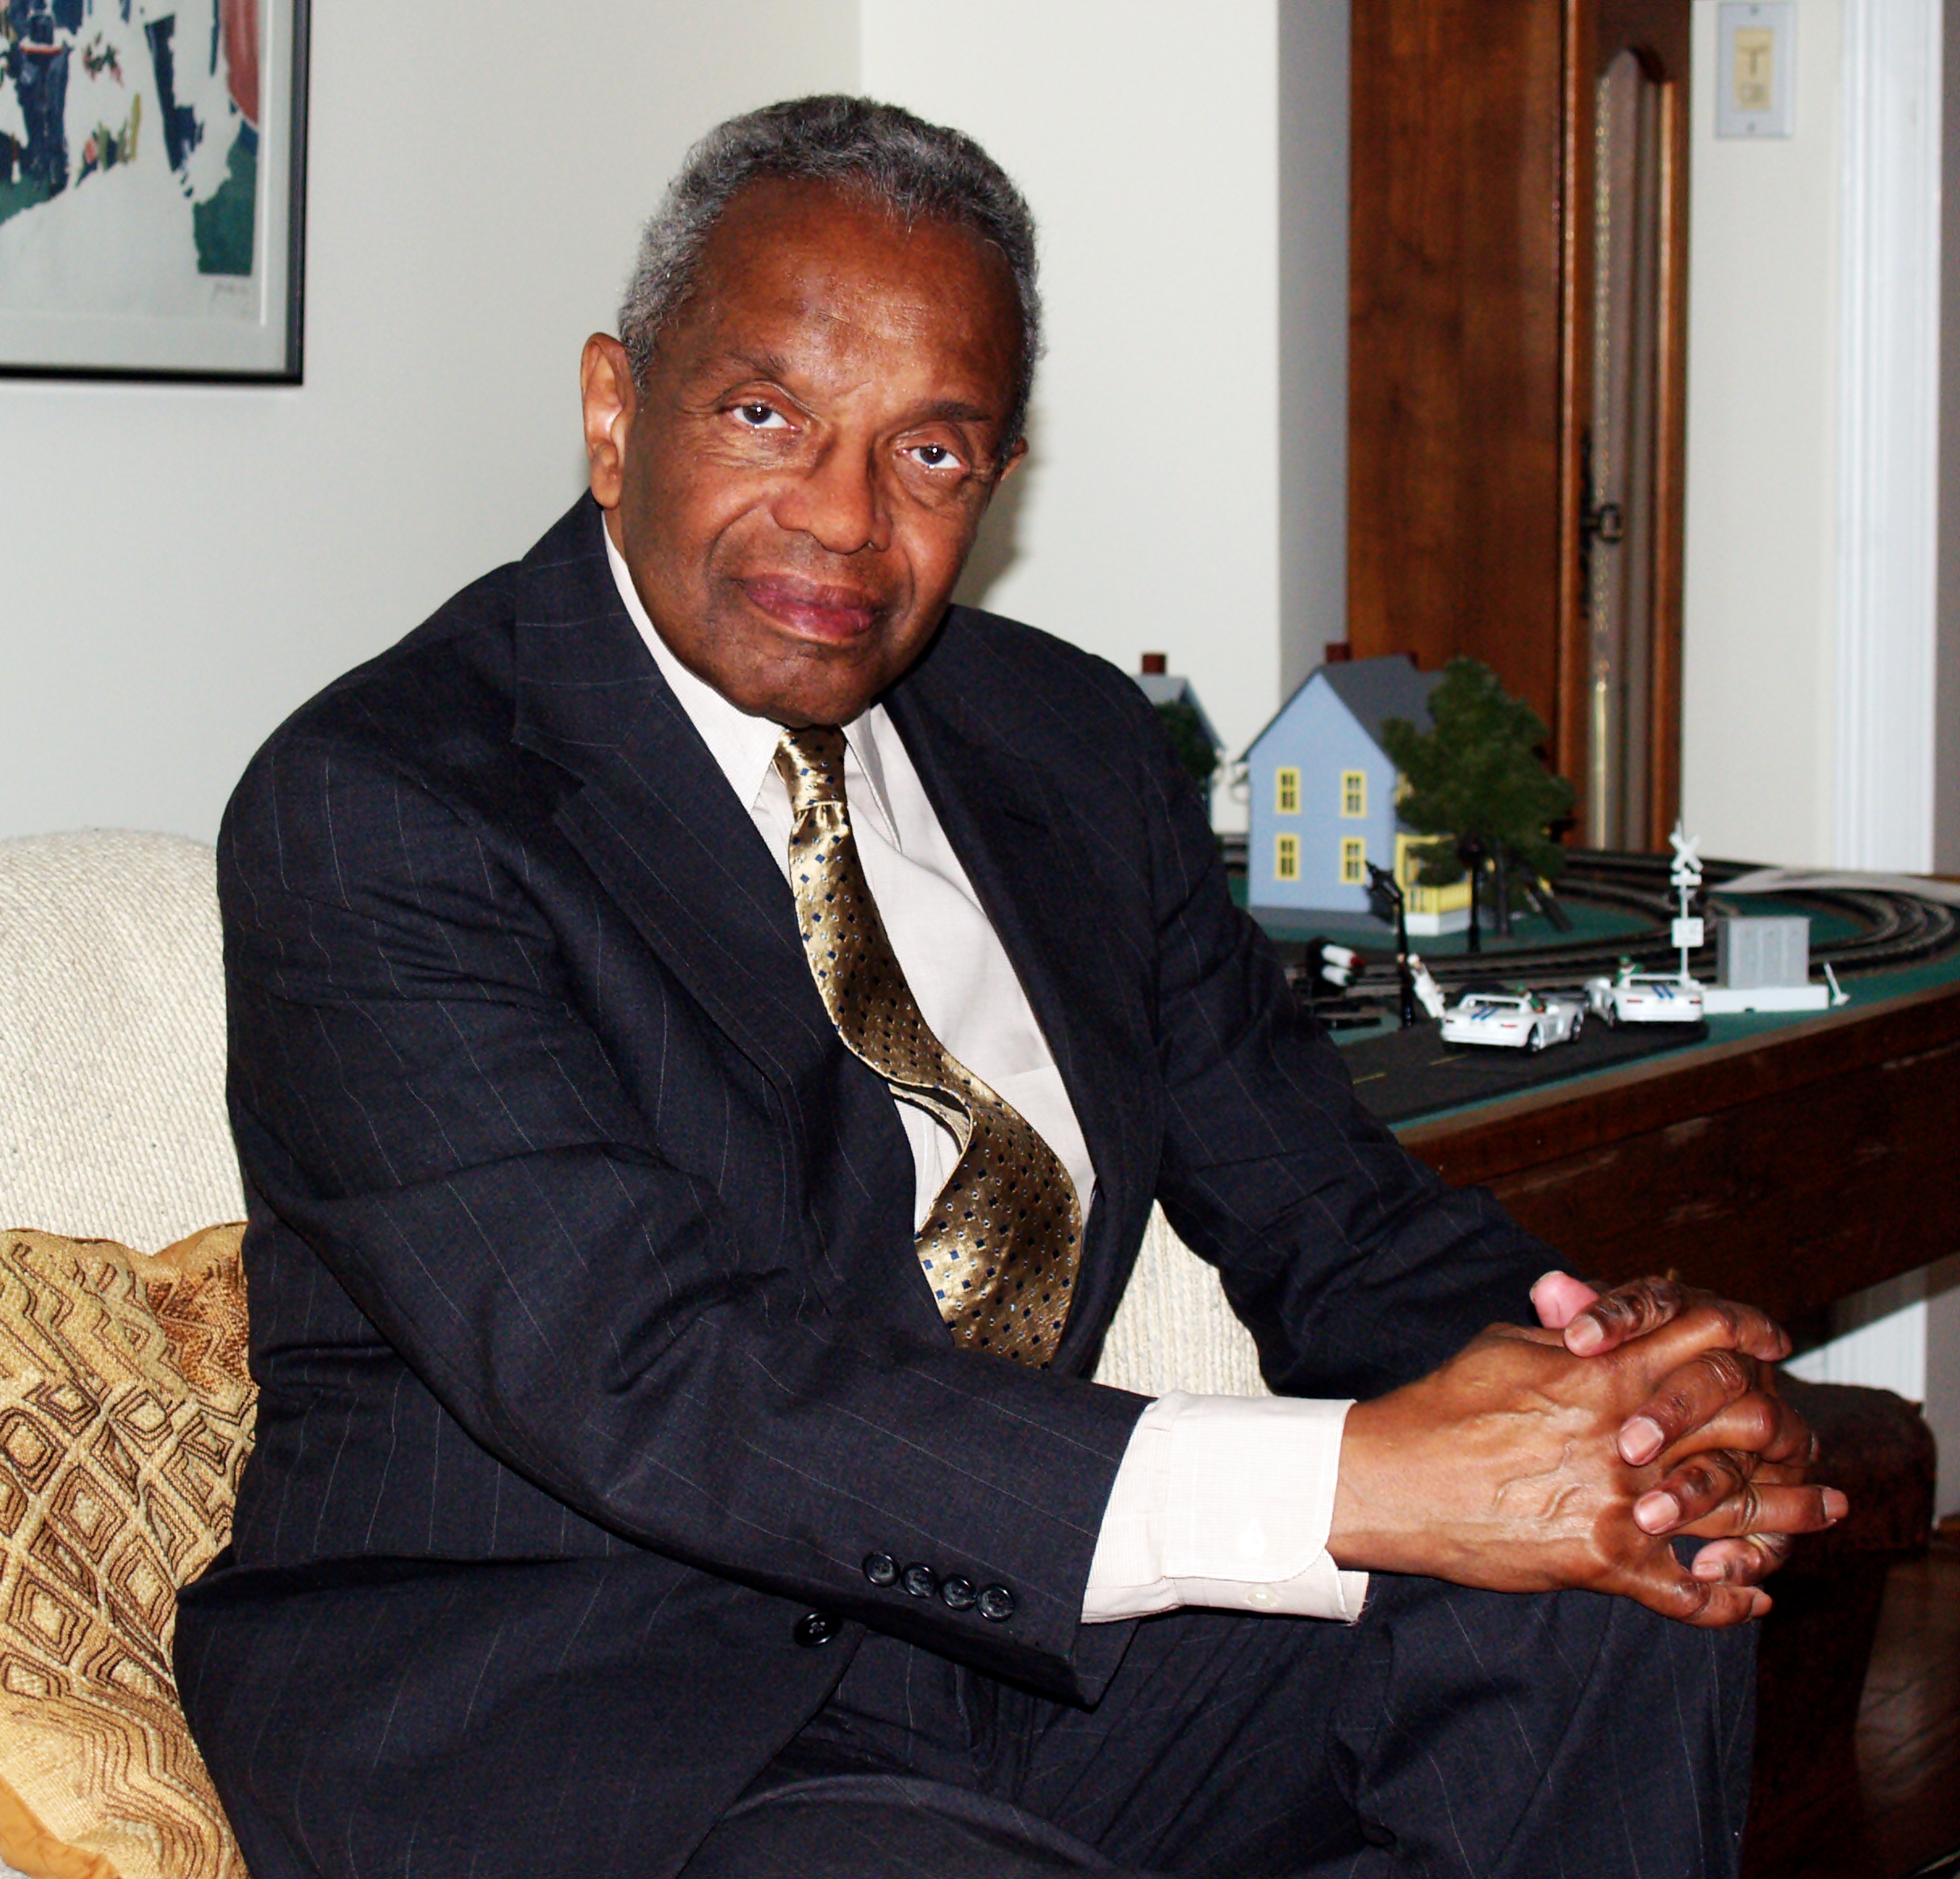 Derrick Bell - Wikipedia